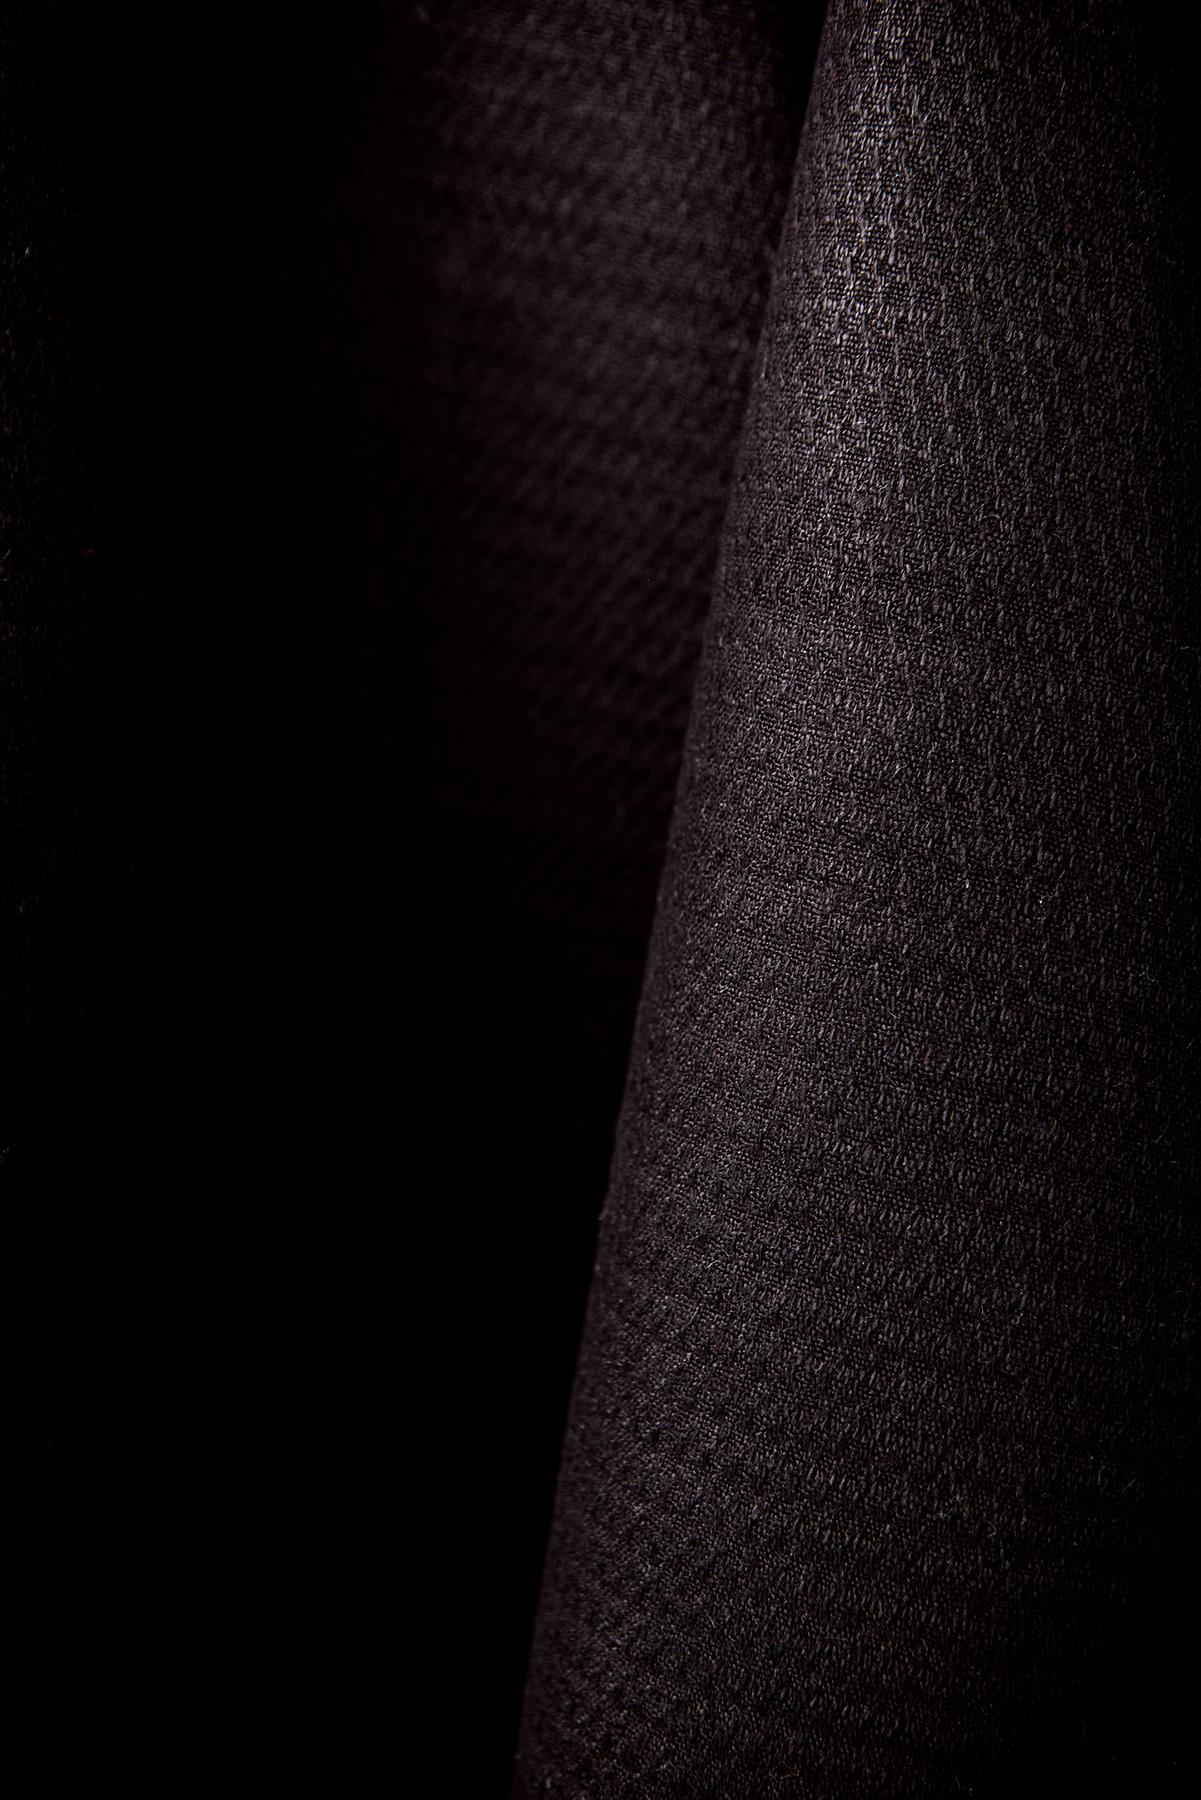 bada-håndklæde-viskestykke-hør-klassbols-linnevav